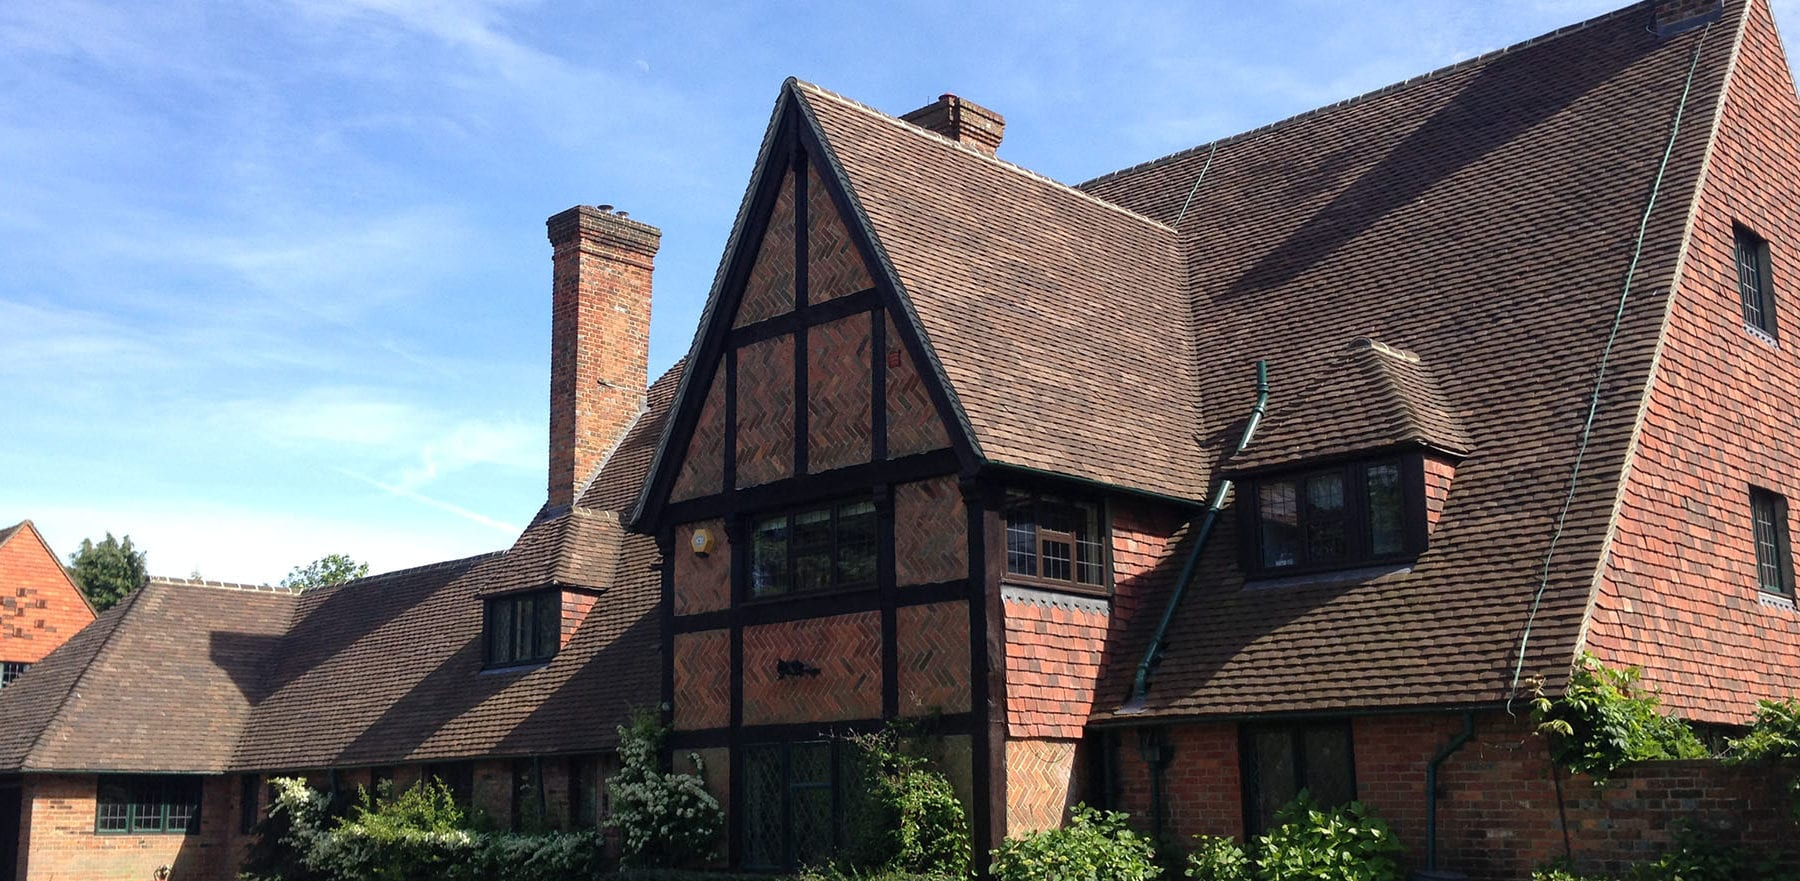 Lifestiles - Handmade Restoration Clay Roof Tiles - Poisenesters, England 4